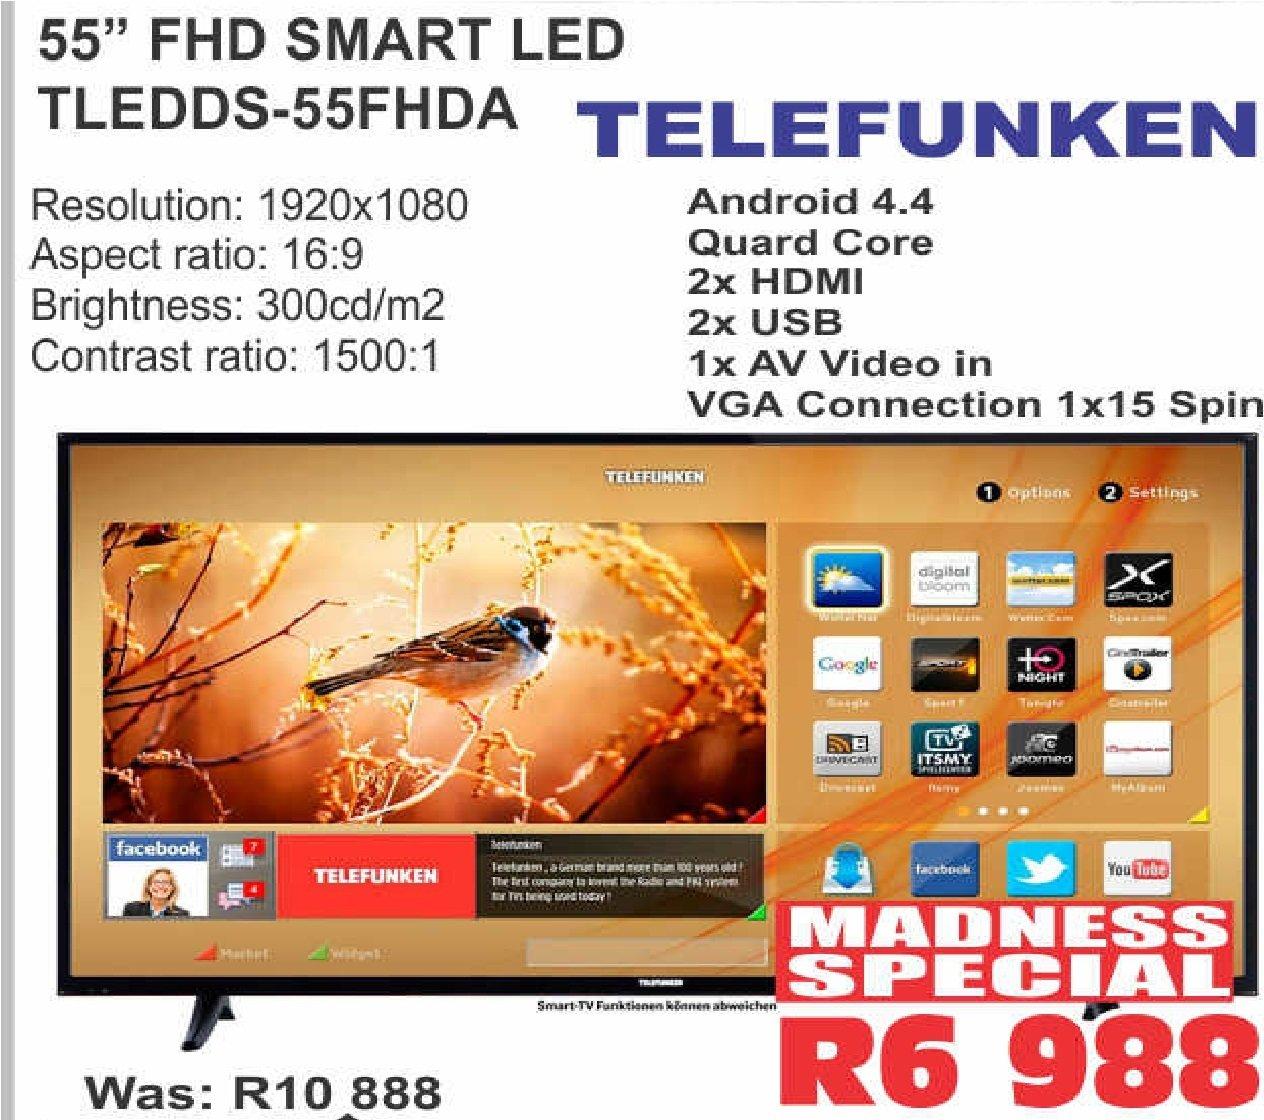 "TELEFUNKEN 55""FHD SMART LED TLEDD-55FHDA"